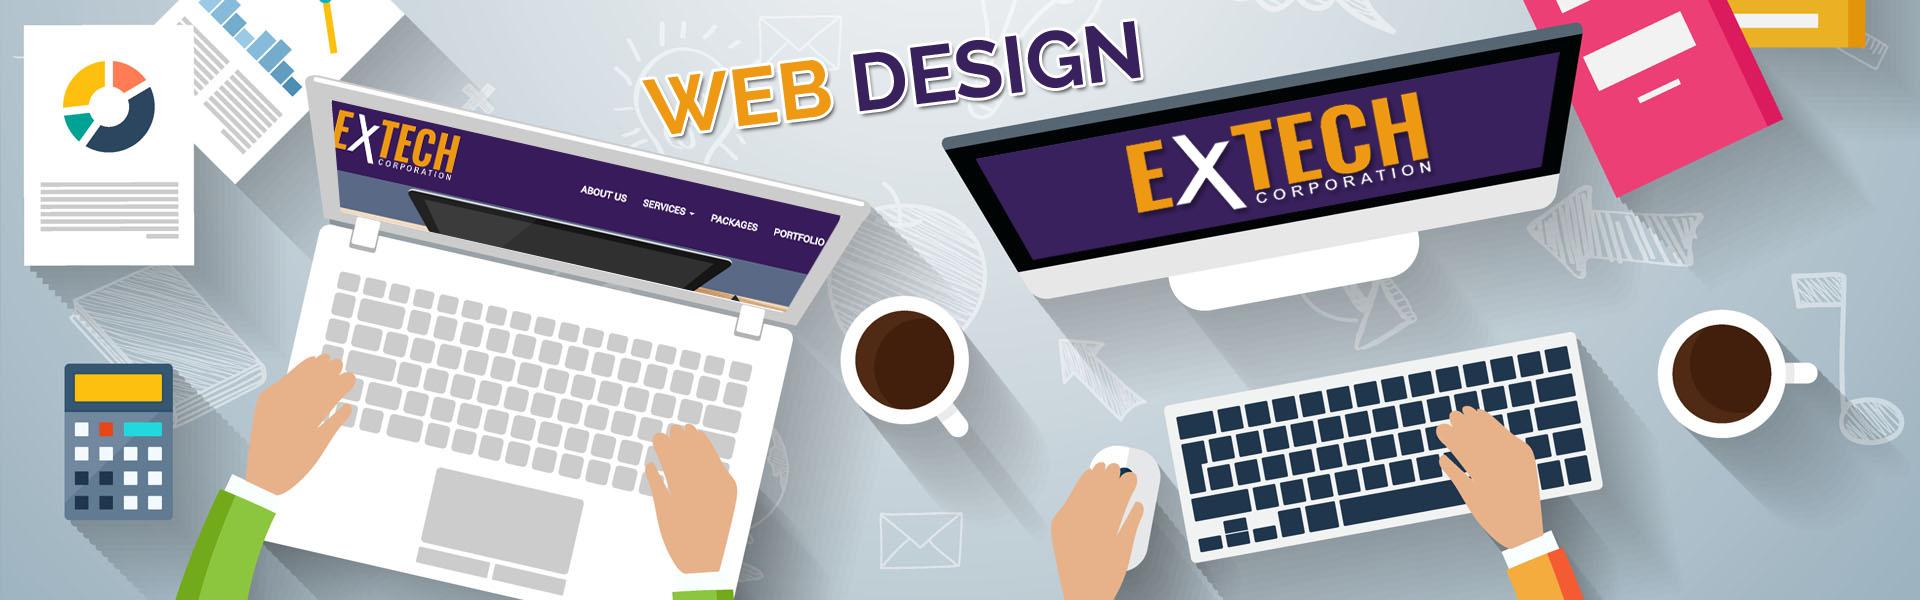 ExTech Corporation | Web Design Pakistan, Website Designing Company  Sialkot, Website Designer Pakistan, Web Developer Pakistan, Website  Developer Company Sialkot, Website Developer Pakistan